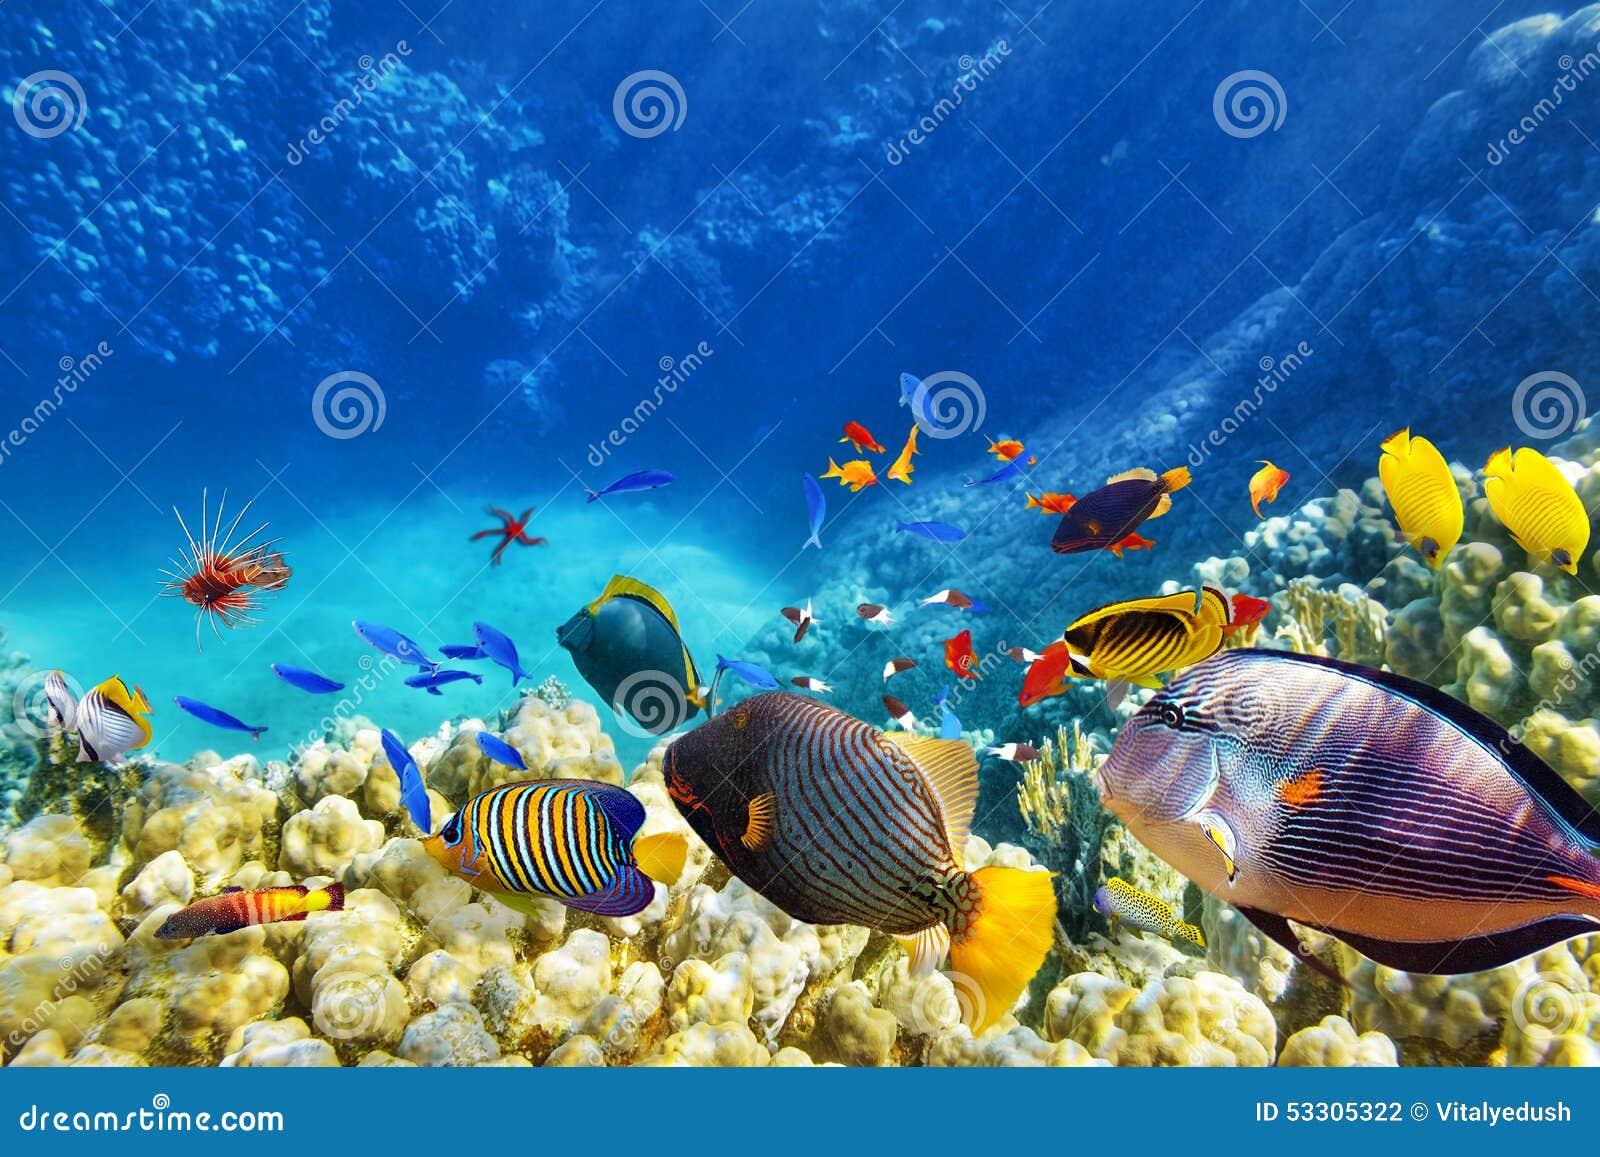 Underwater Tropical Fish Underwater World With ...